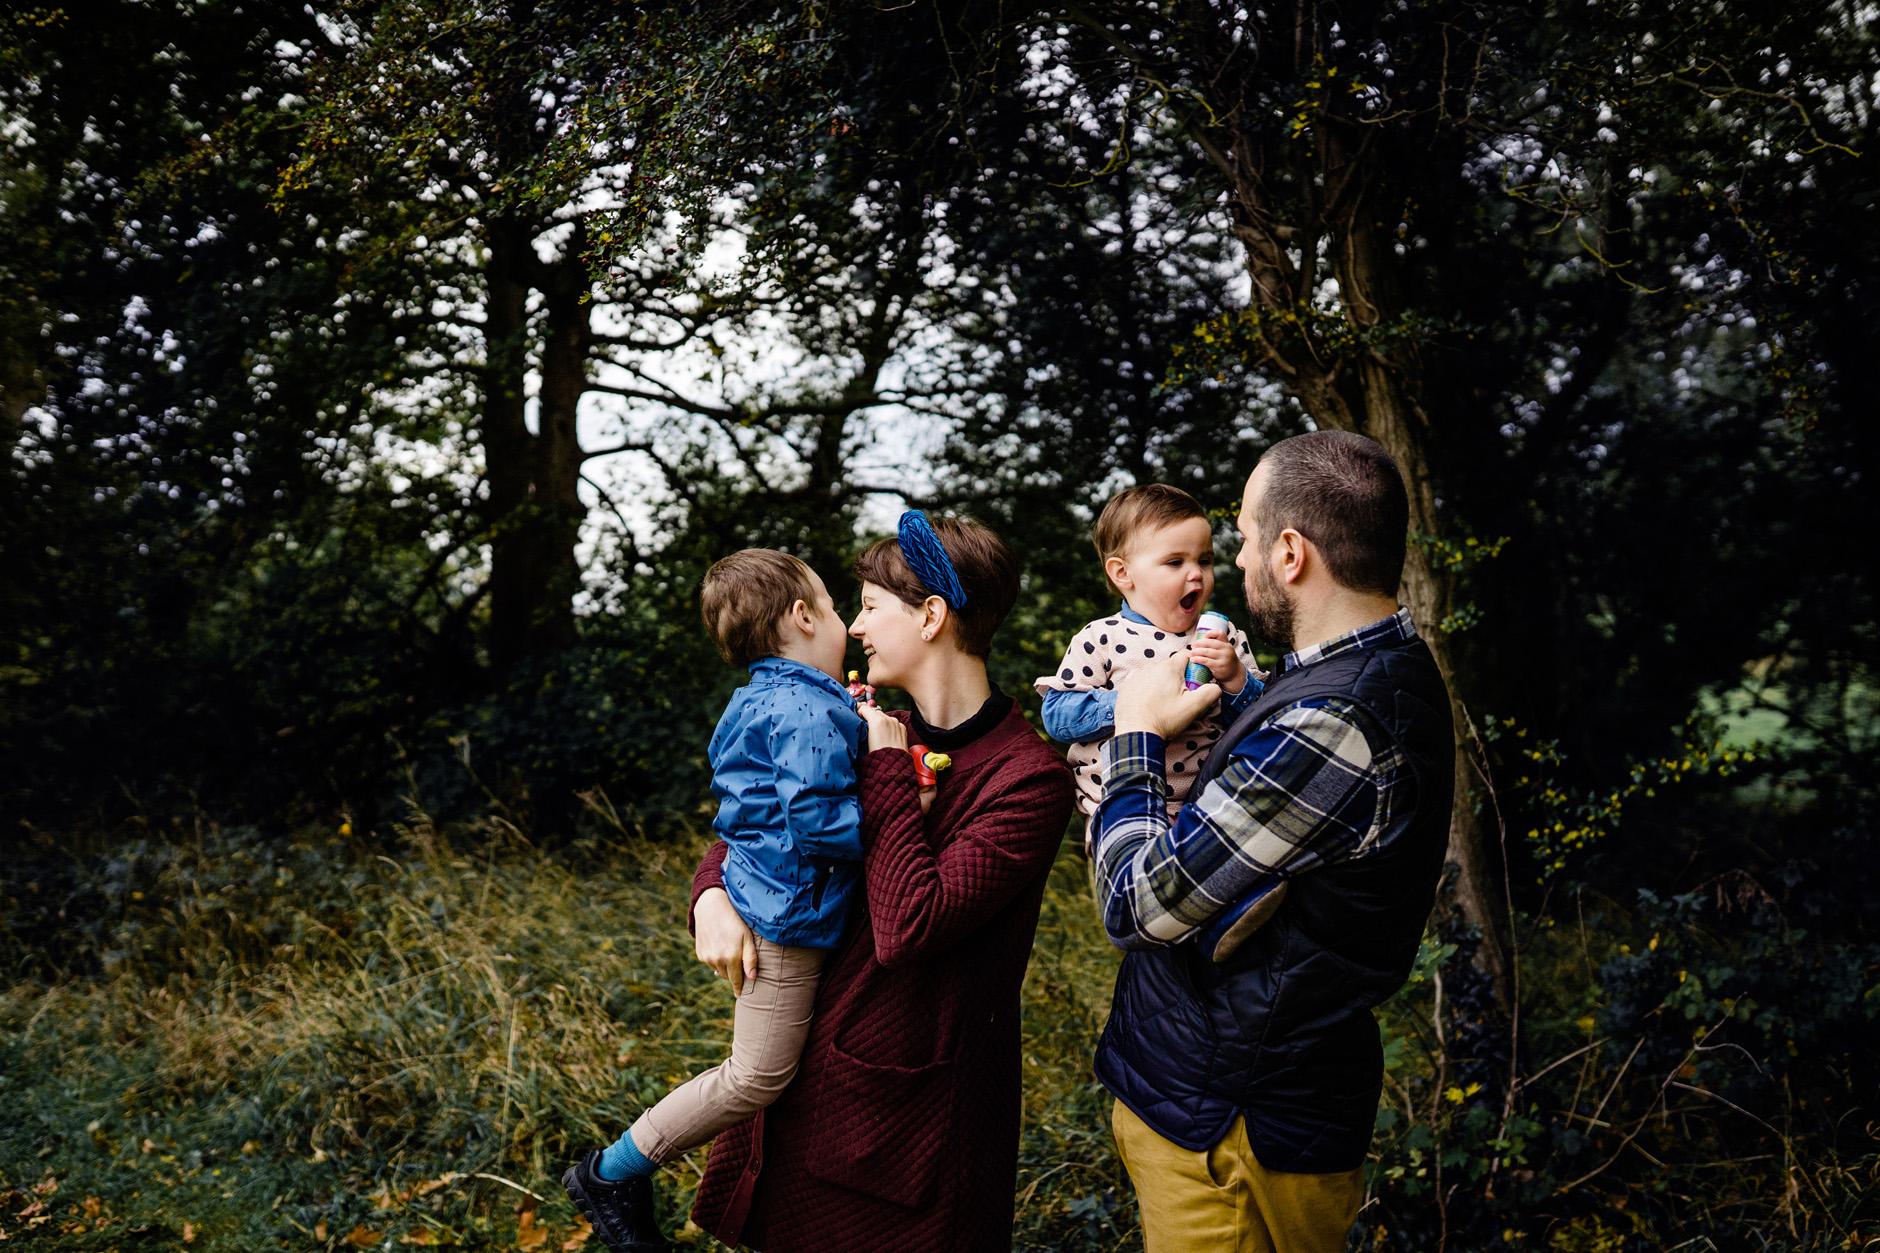 candid-natural-children-family-photographer-dublin-0011.jpg